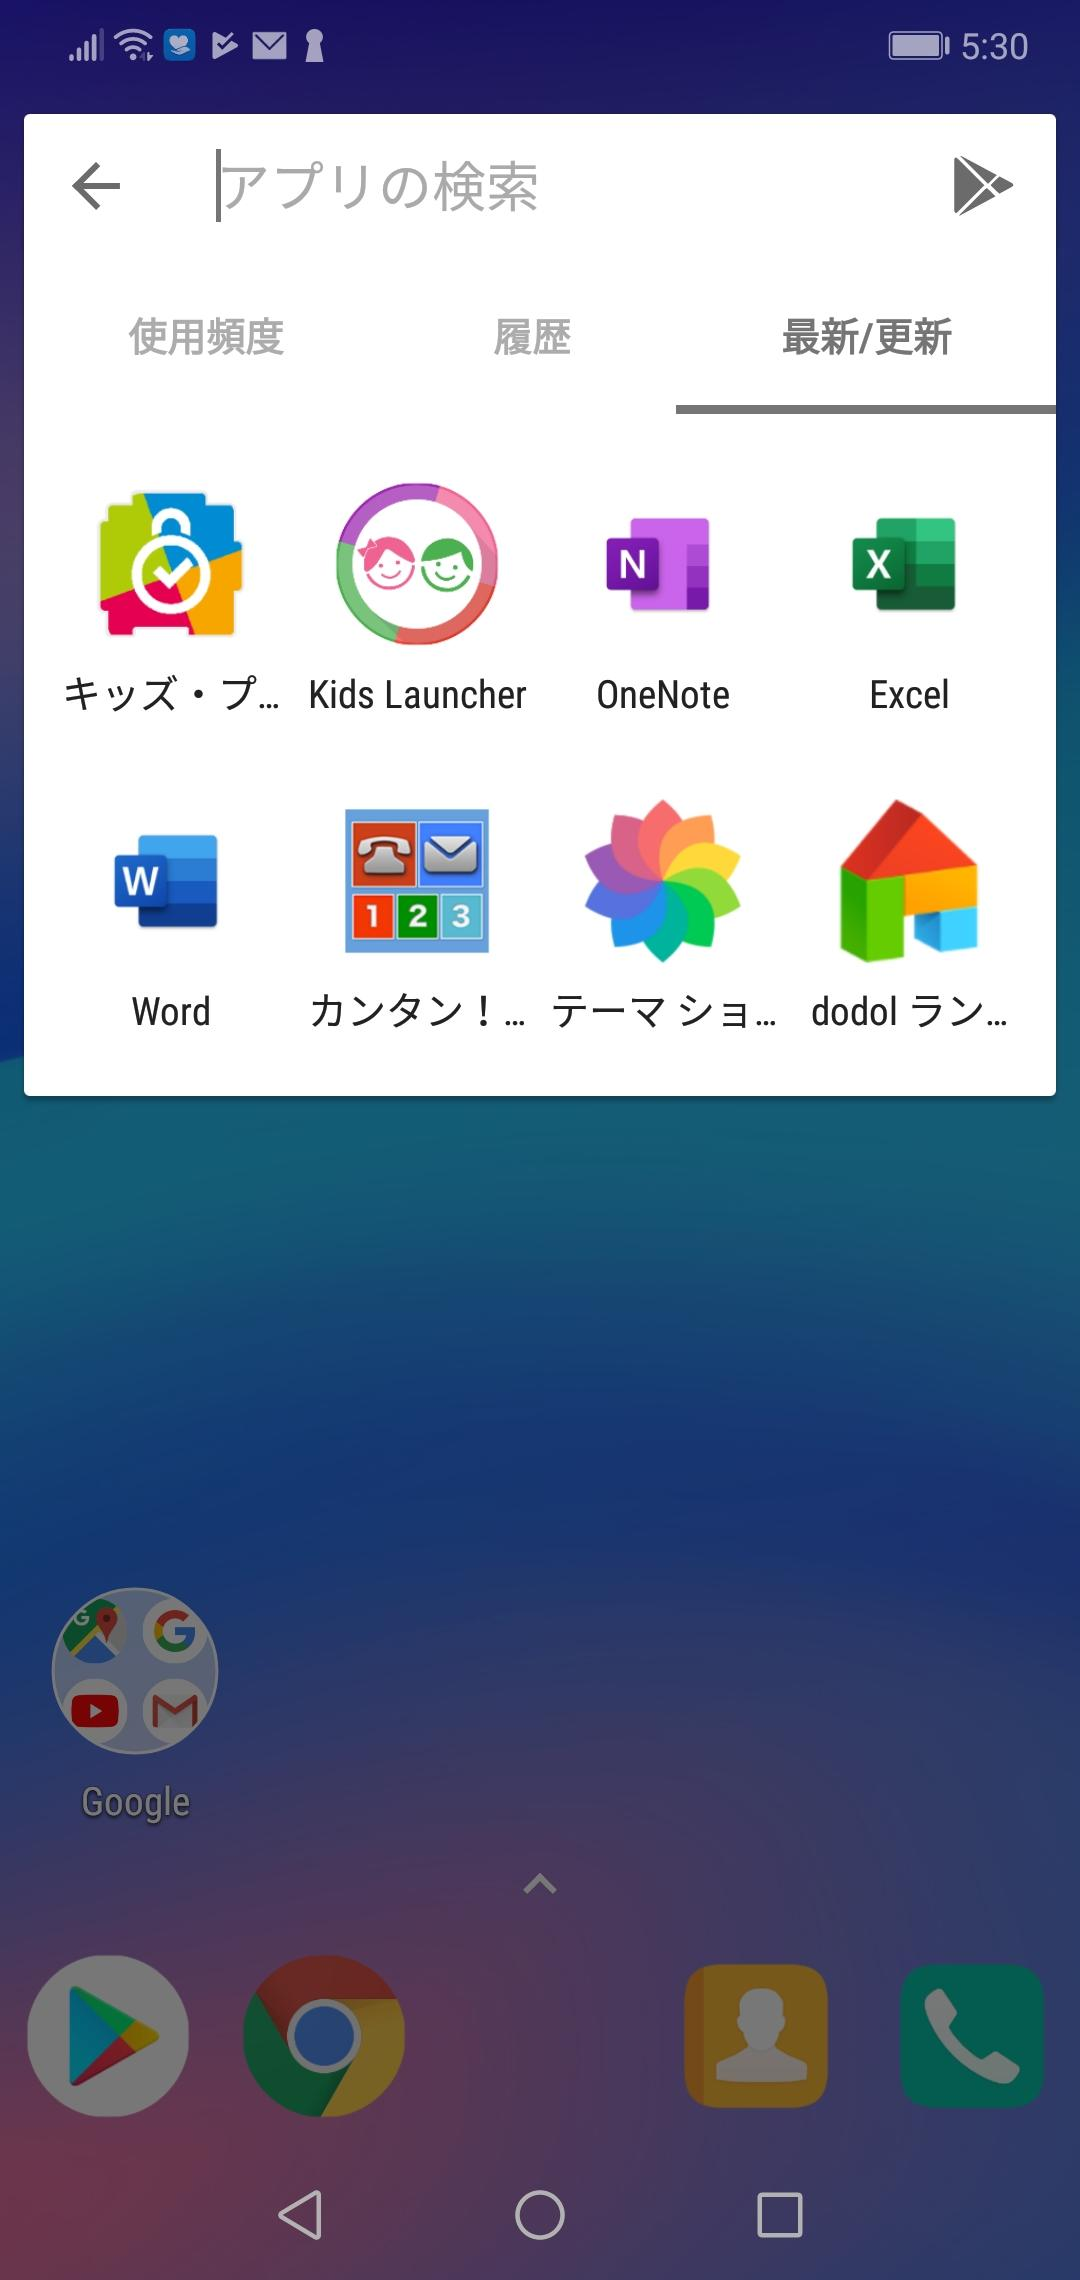 Nova Launcher ホーム画面